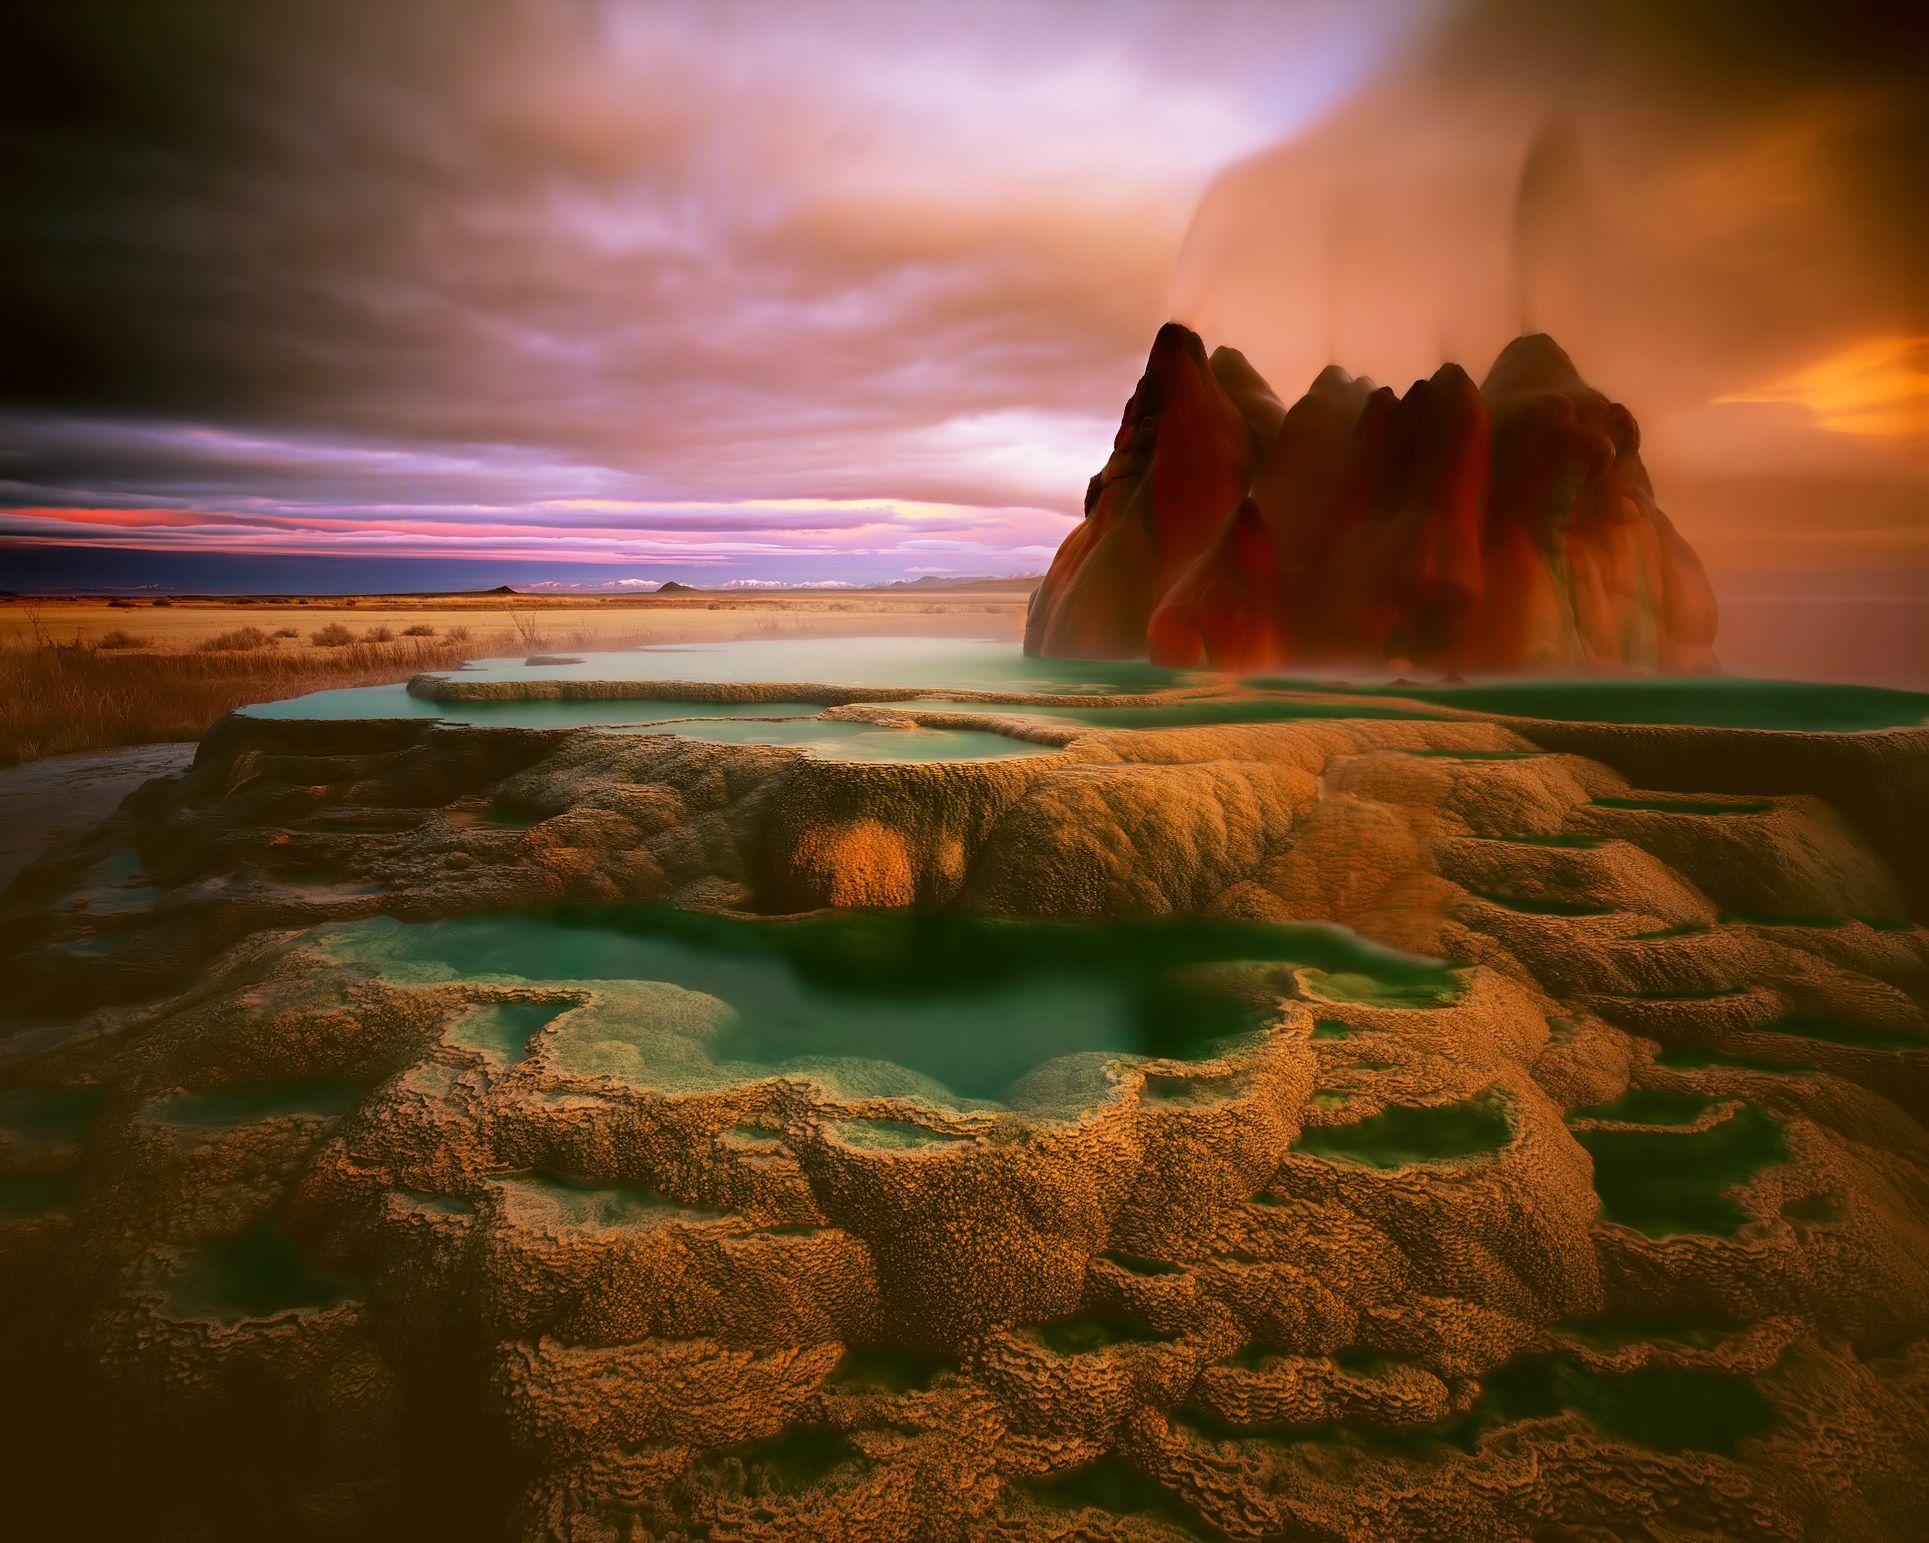 Fly geyser nevada hd wallpaper background image 1929x1543 id 679227 wallpaper abyss - Nevada wallpaper hd ...